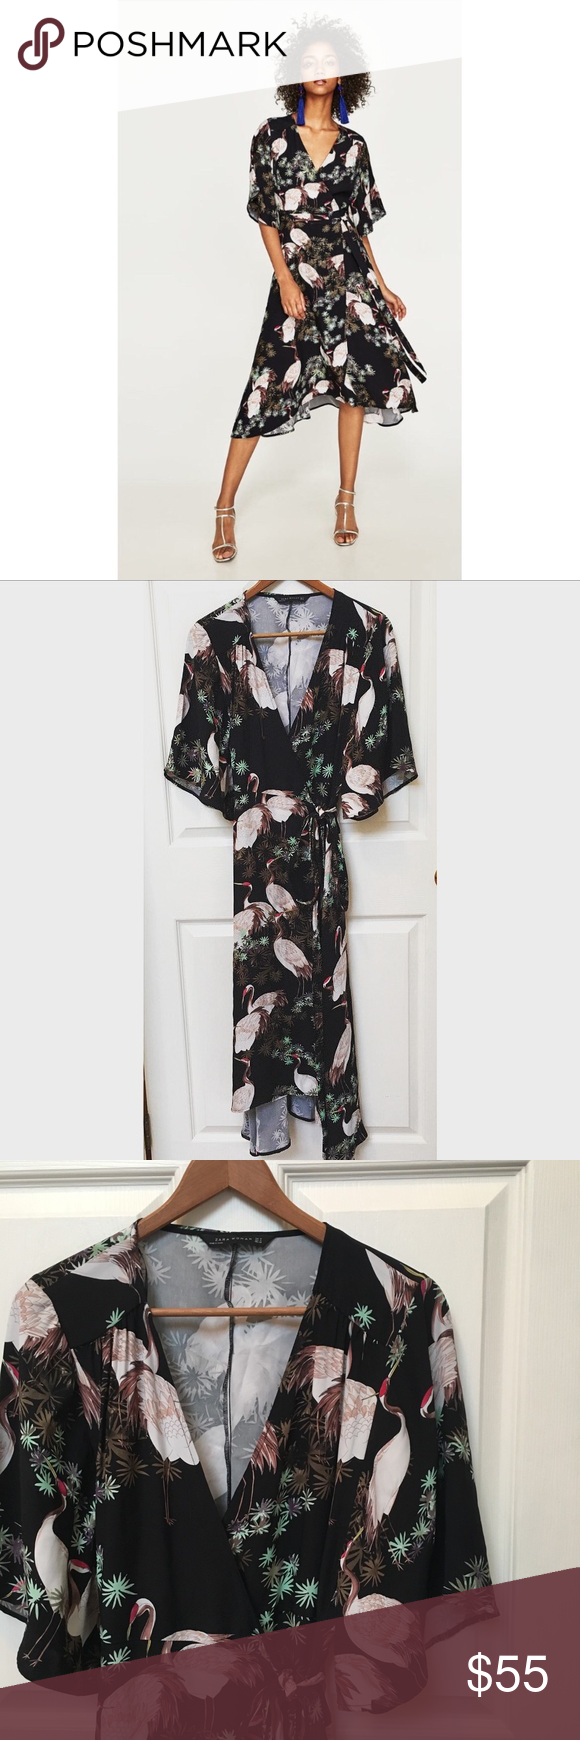 001510ec Zara Crane Print Midi Wrap Dress Stunning midi wrap dress from Zara. Great  condition, lovely pattern and kimono style sleeves. This is a reposh, ...